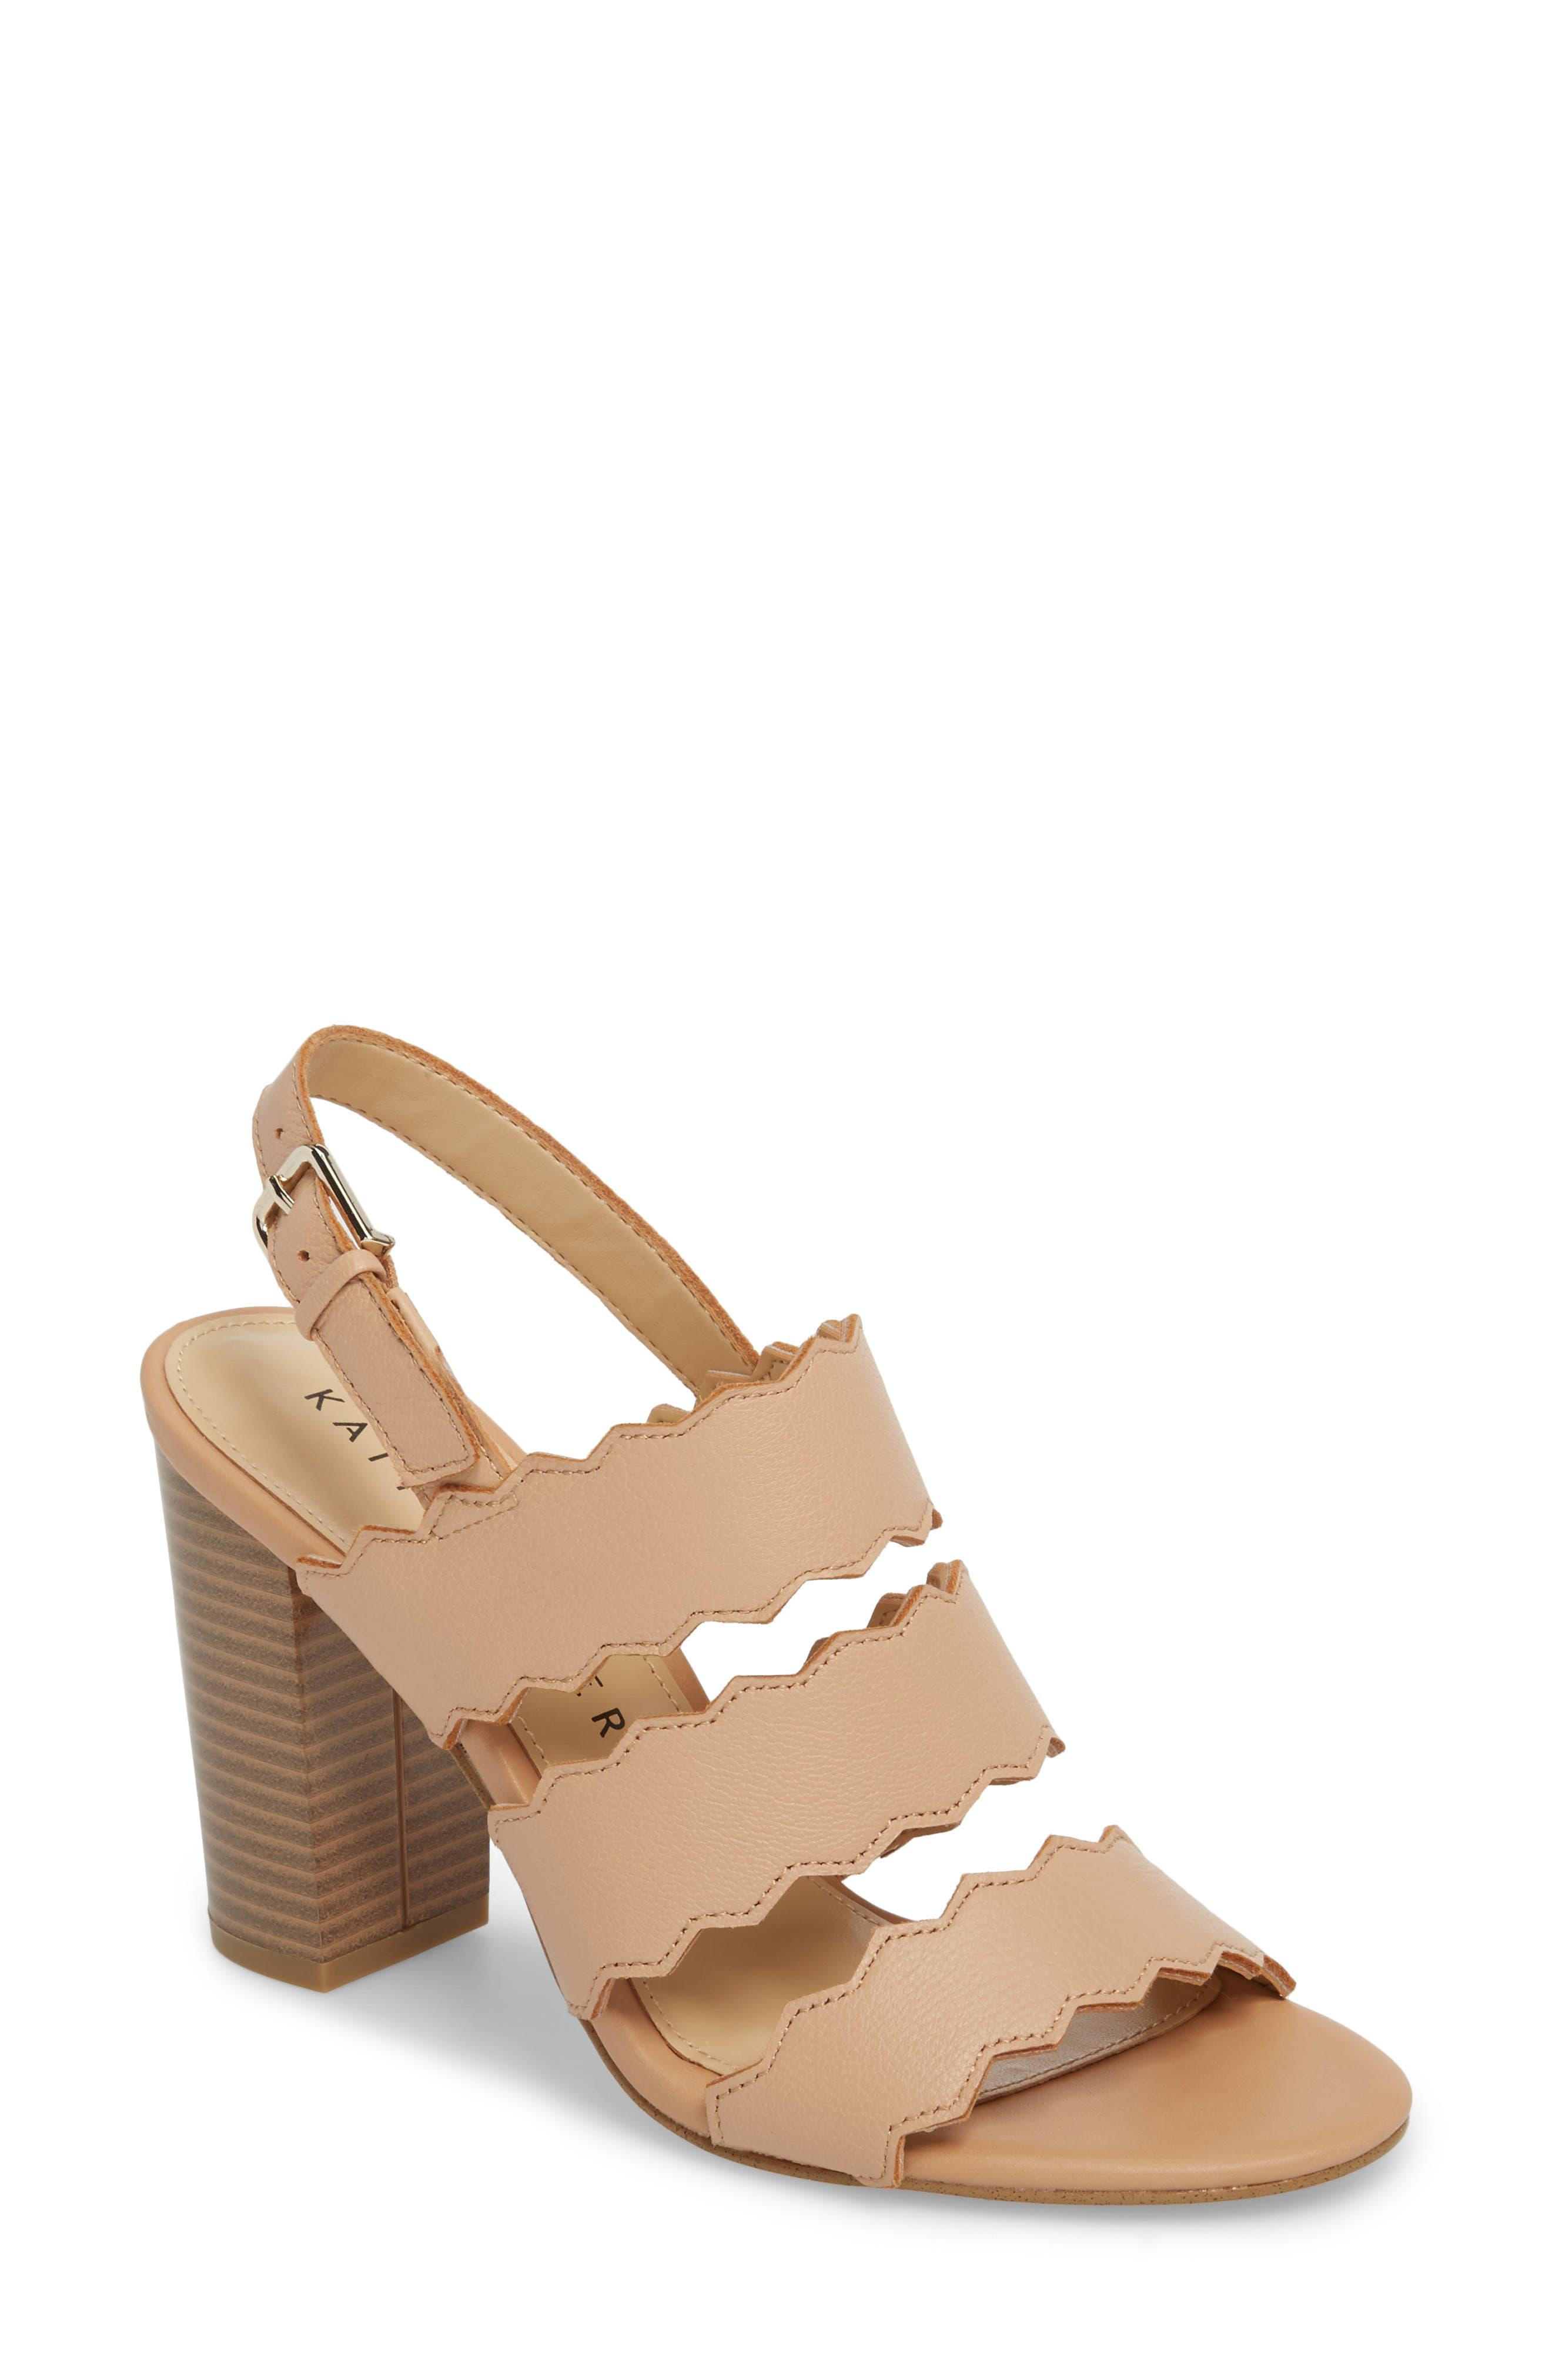 Open Toe Sandal,                         Main,                         color, NUDE LEATHER